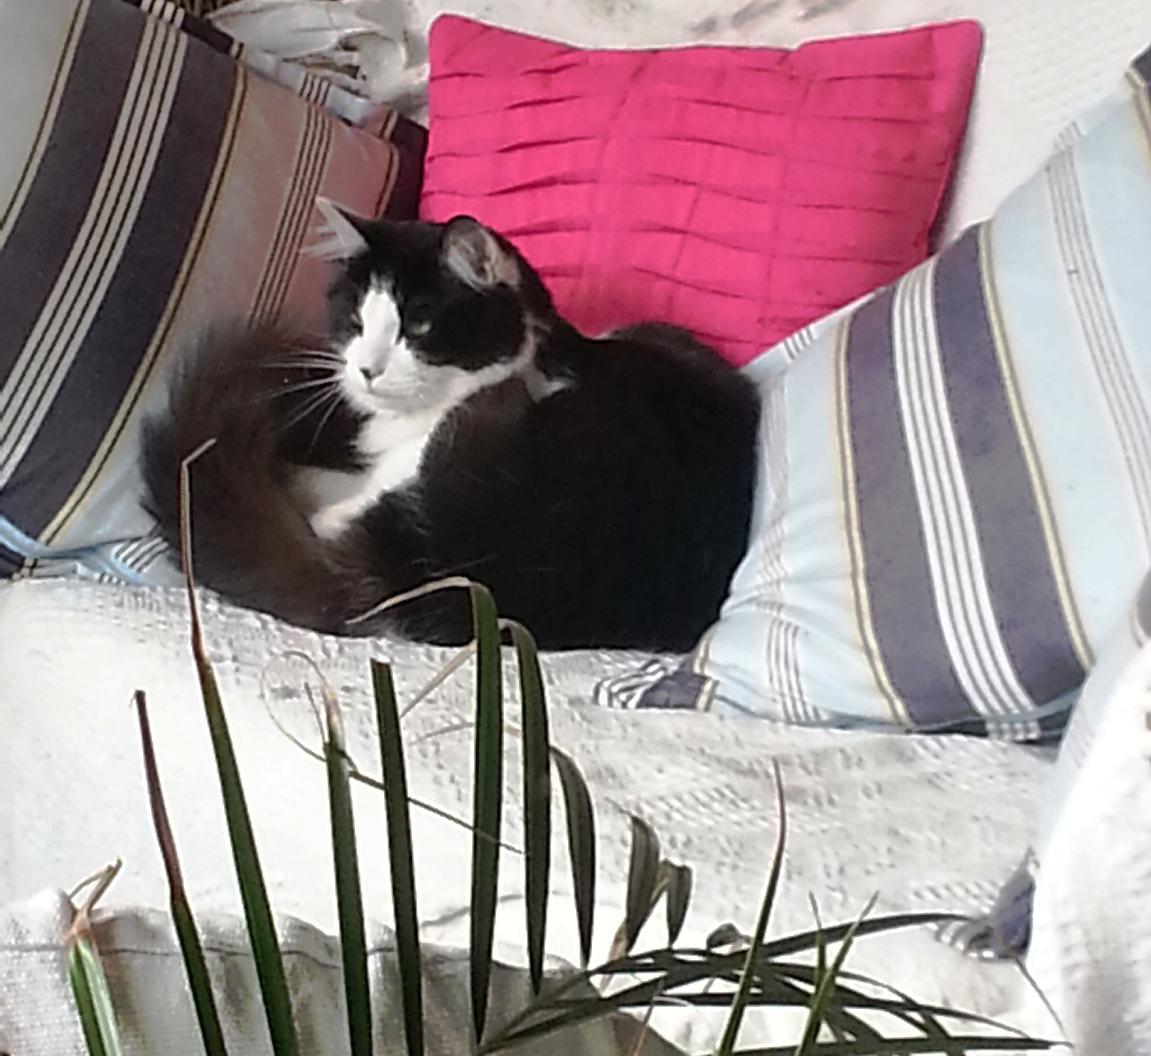 angus cat enjoying life outside